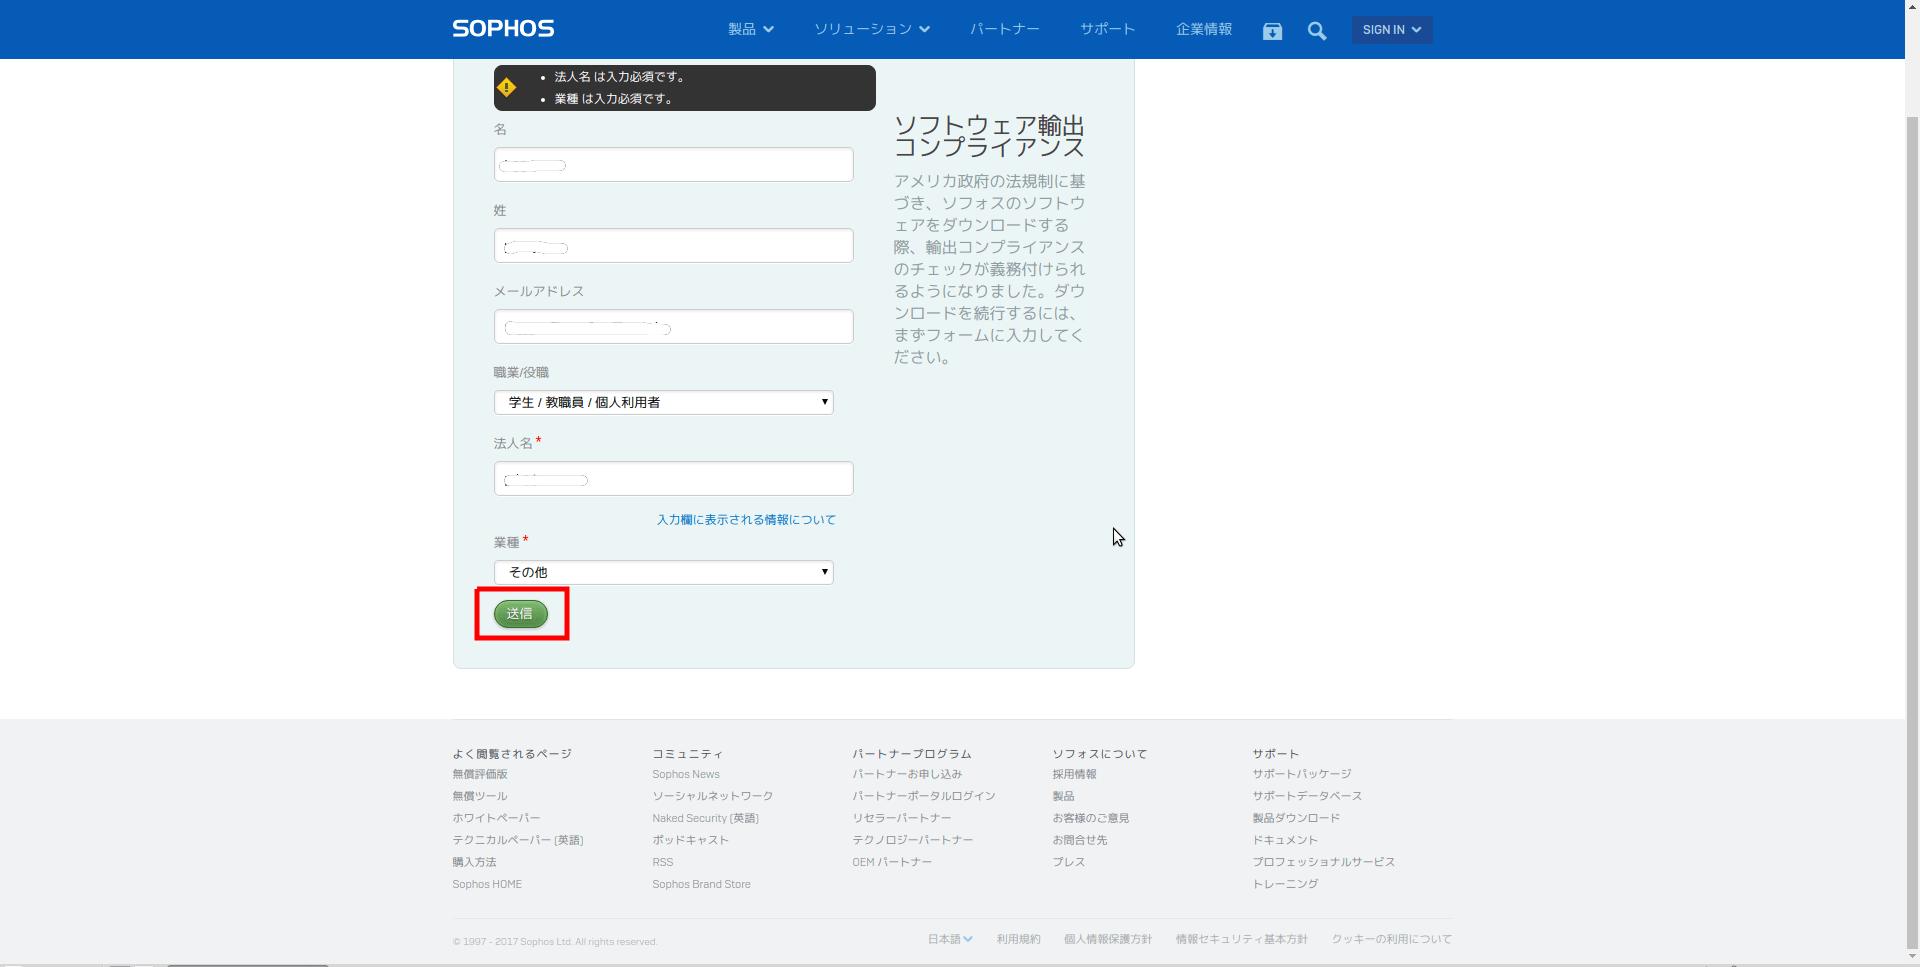 Sophos Anti-Virus | 早稲田大学ITサービスナビ